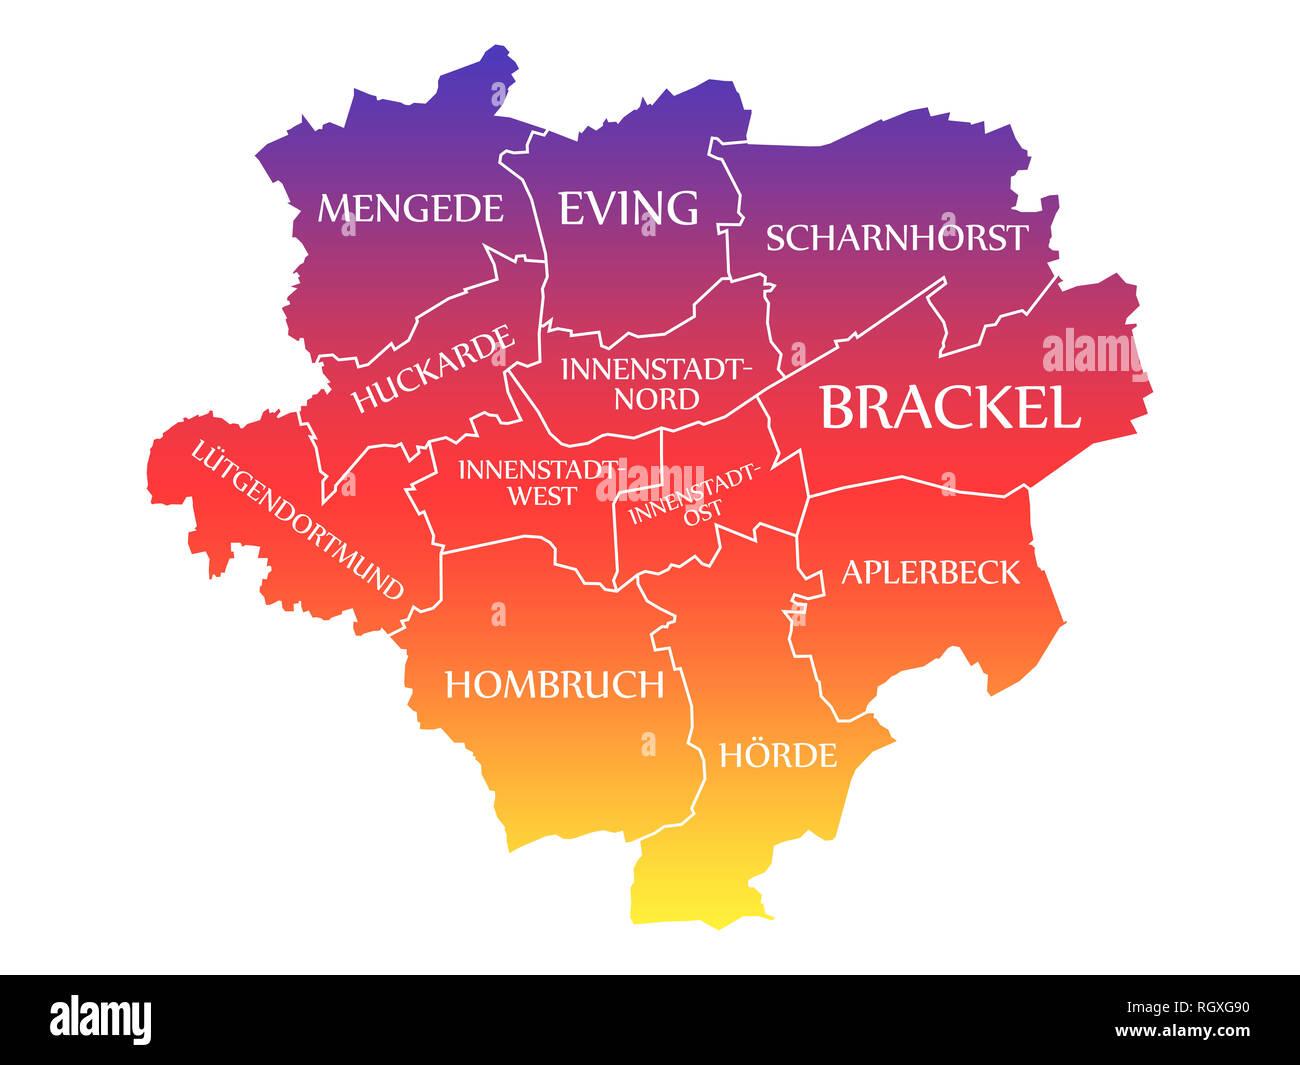 Dortmund City Map Germany De Labelled Rainbow Colored Illustration